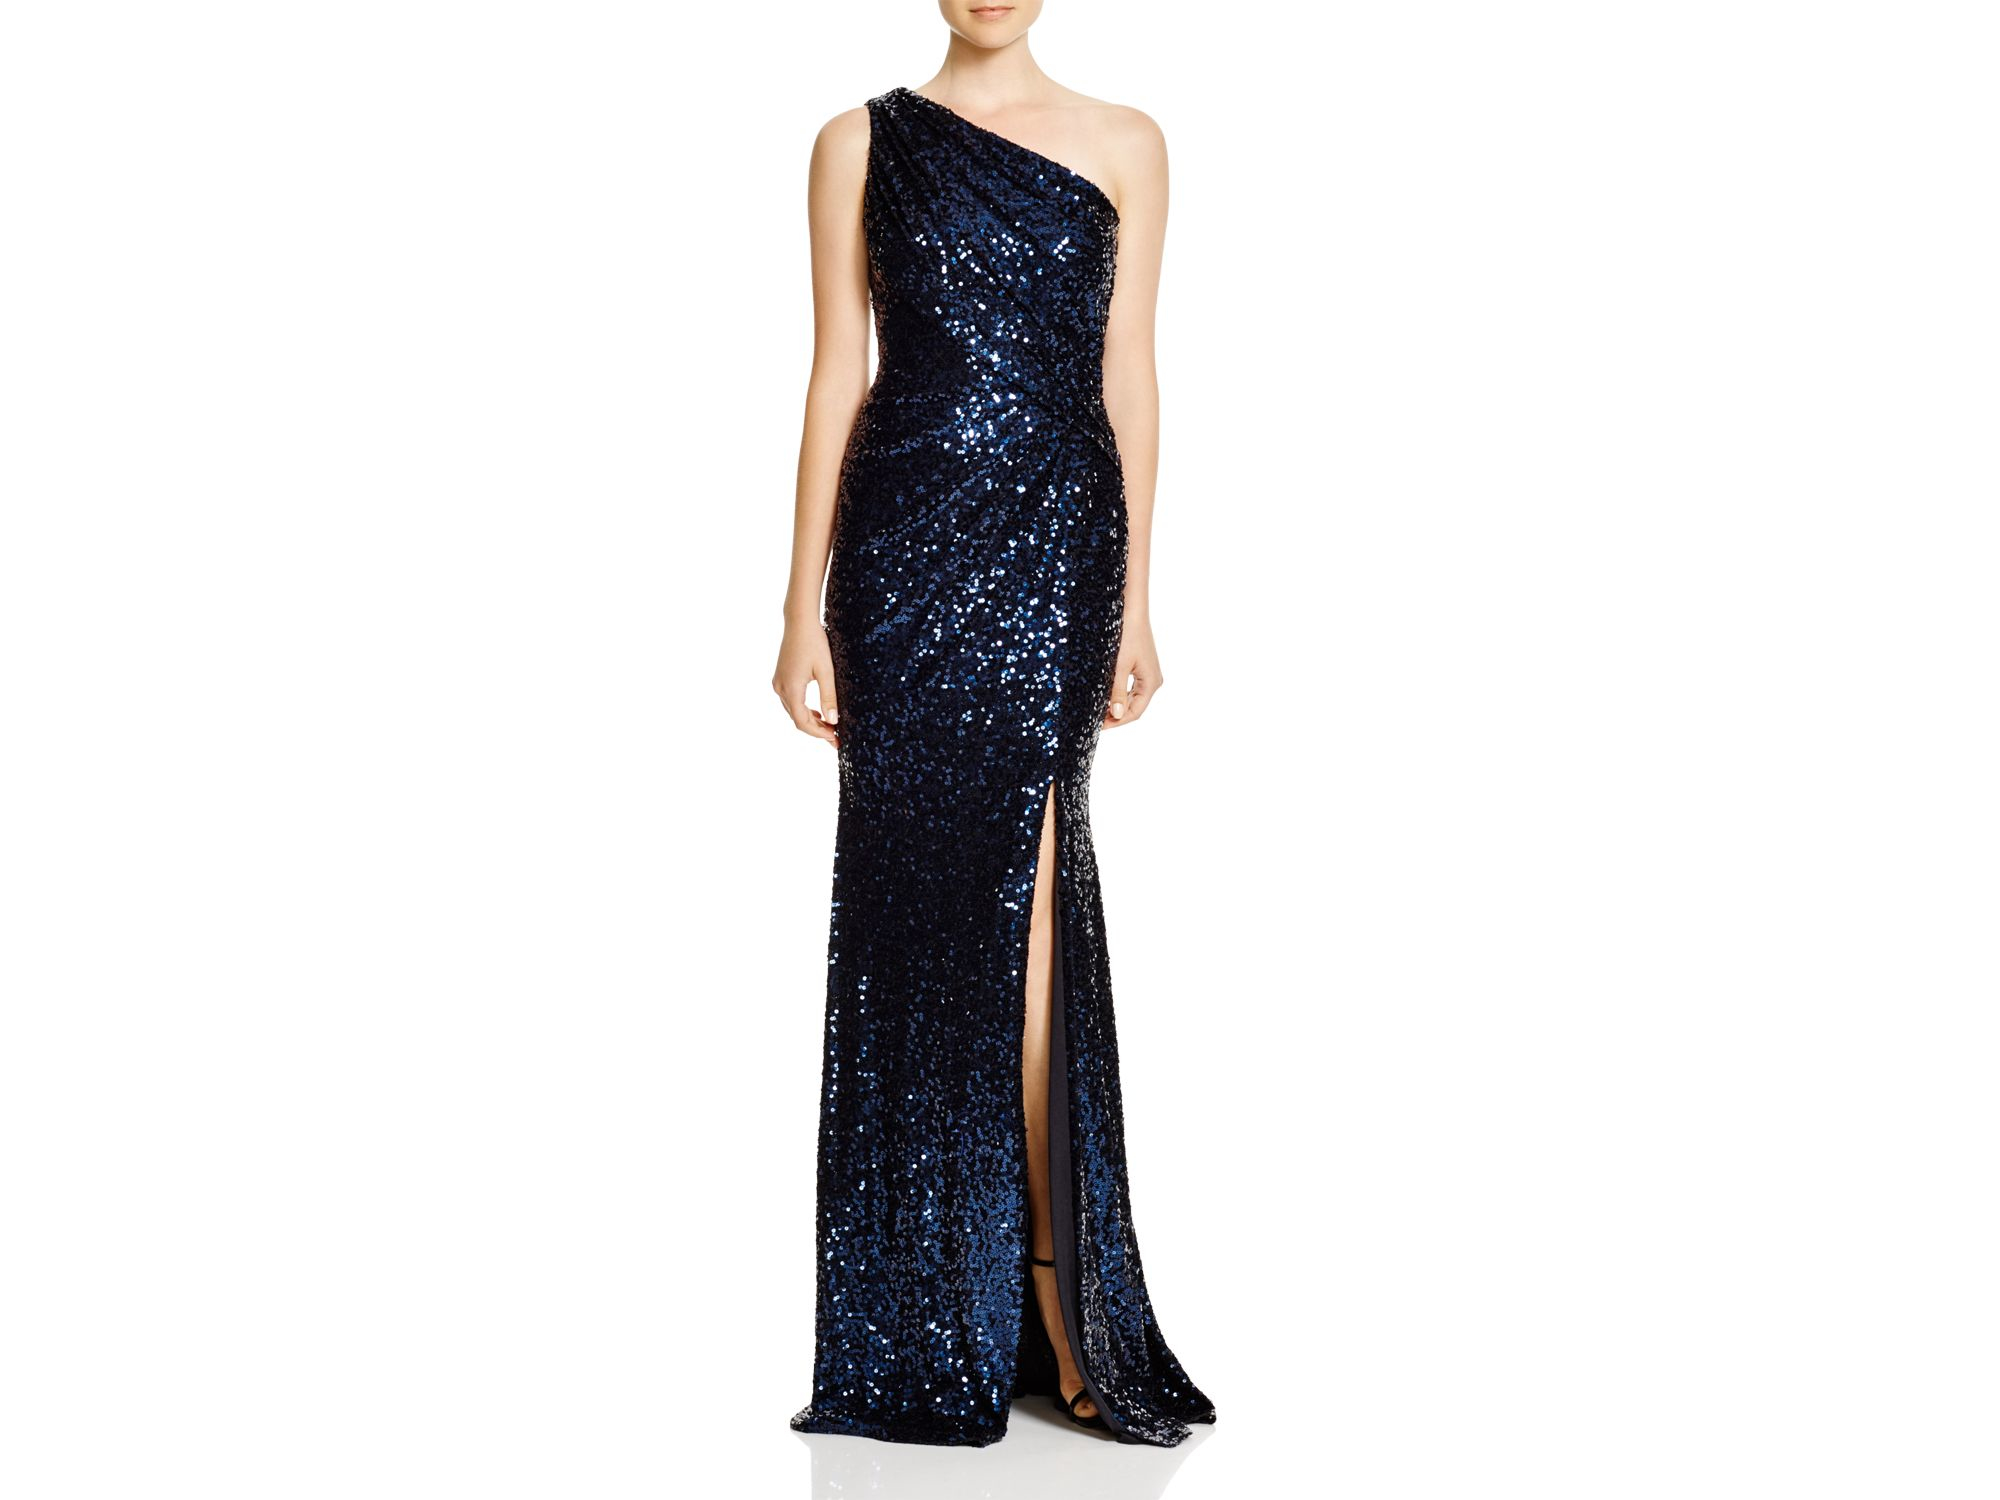 Lyst - Badgley Mischka One Shoulder Sequin Gown in Blue